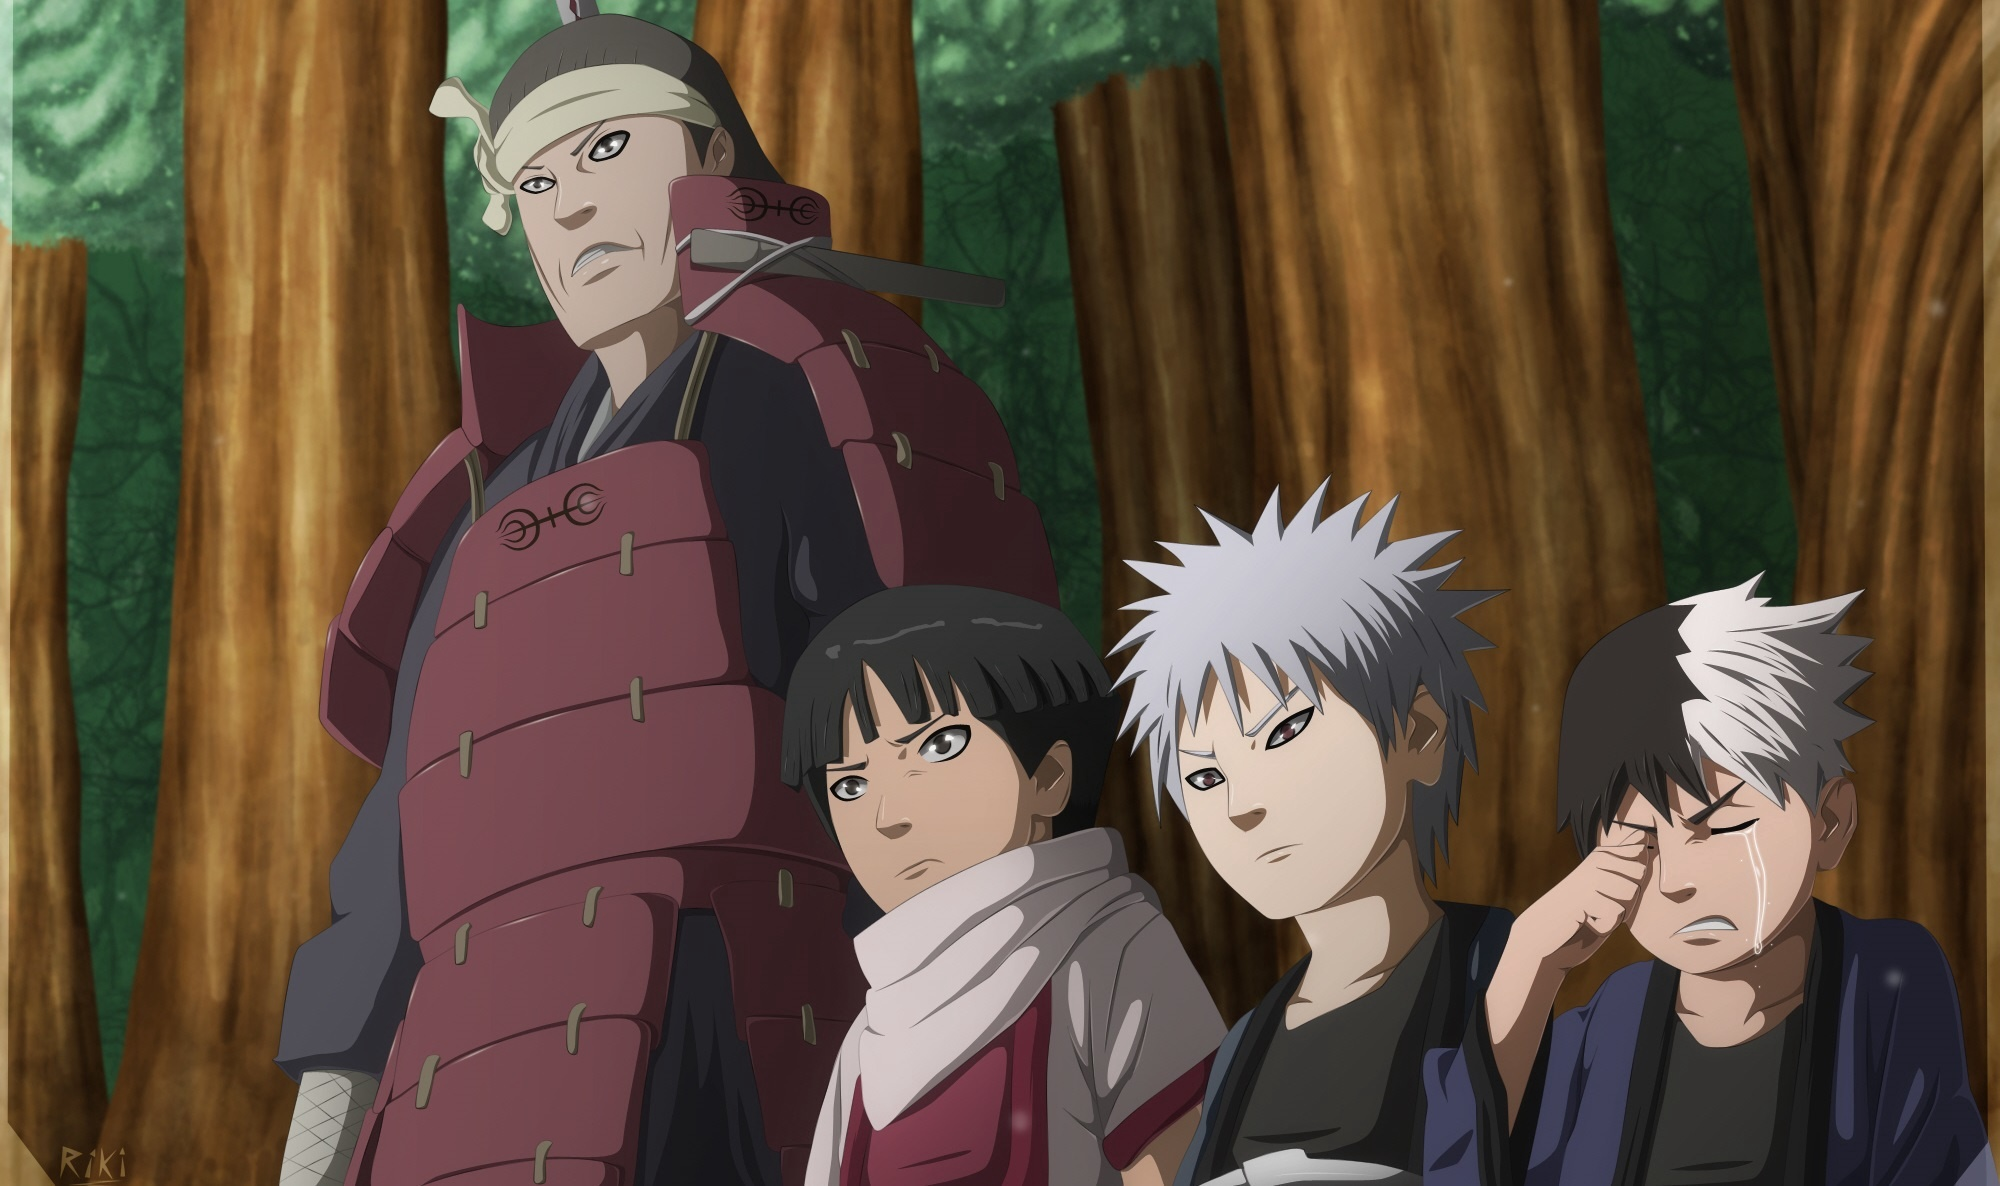 Naruto Live Wallpaper Iphone X Senju Family Fondo De Pantalla Hd Fondo De Escritorio